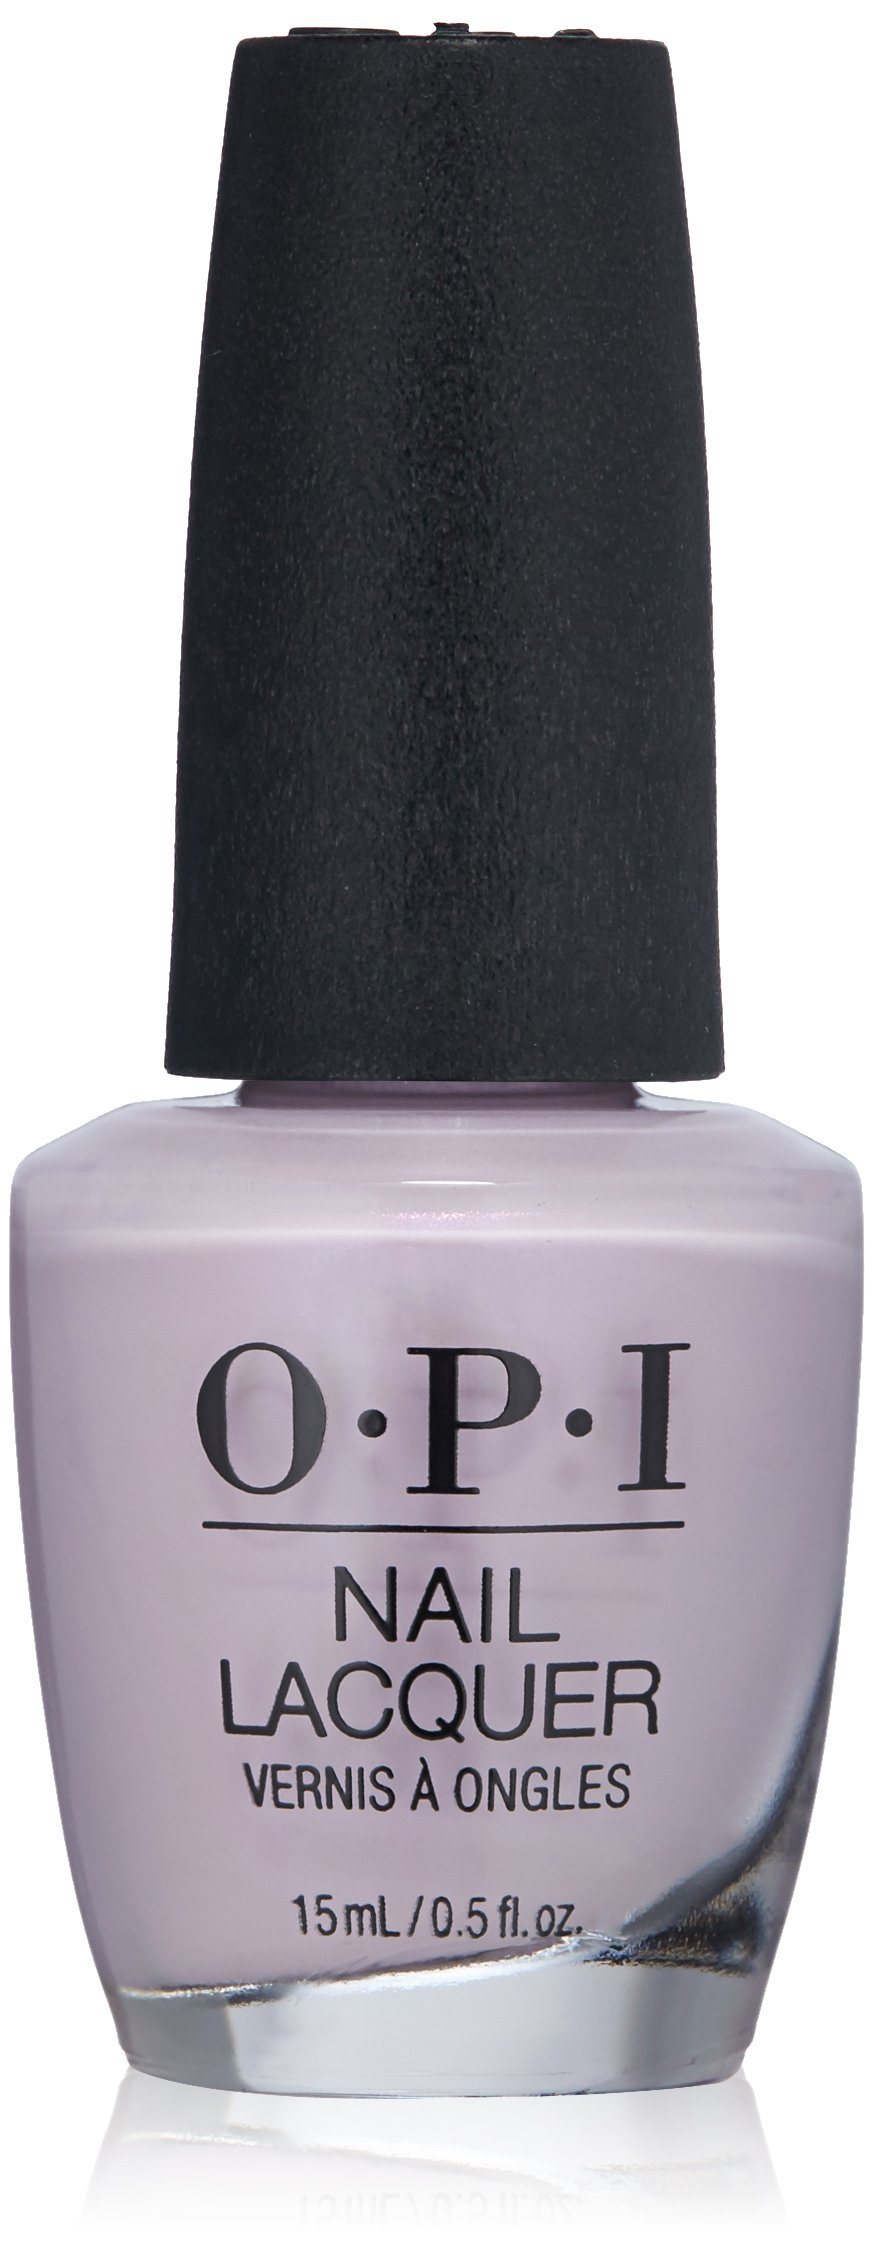 OPI Nail Lacquer, Frenchie Likes To Kiss?, 0.5 Fl. Oz.